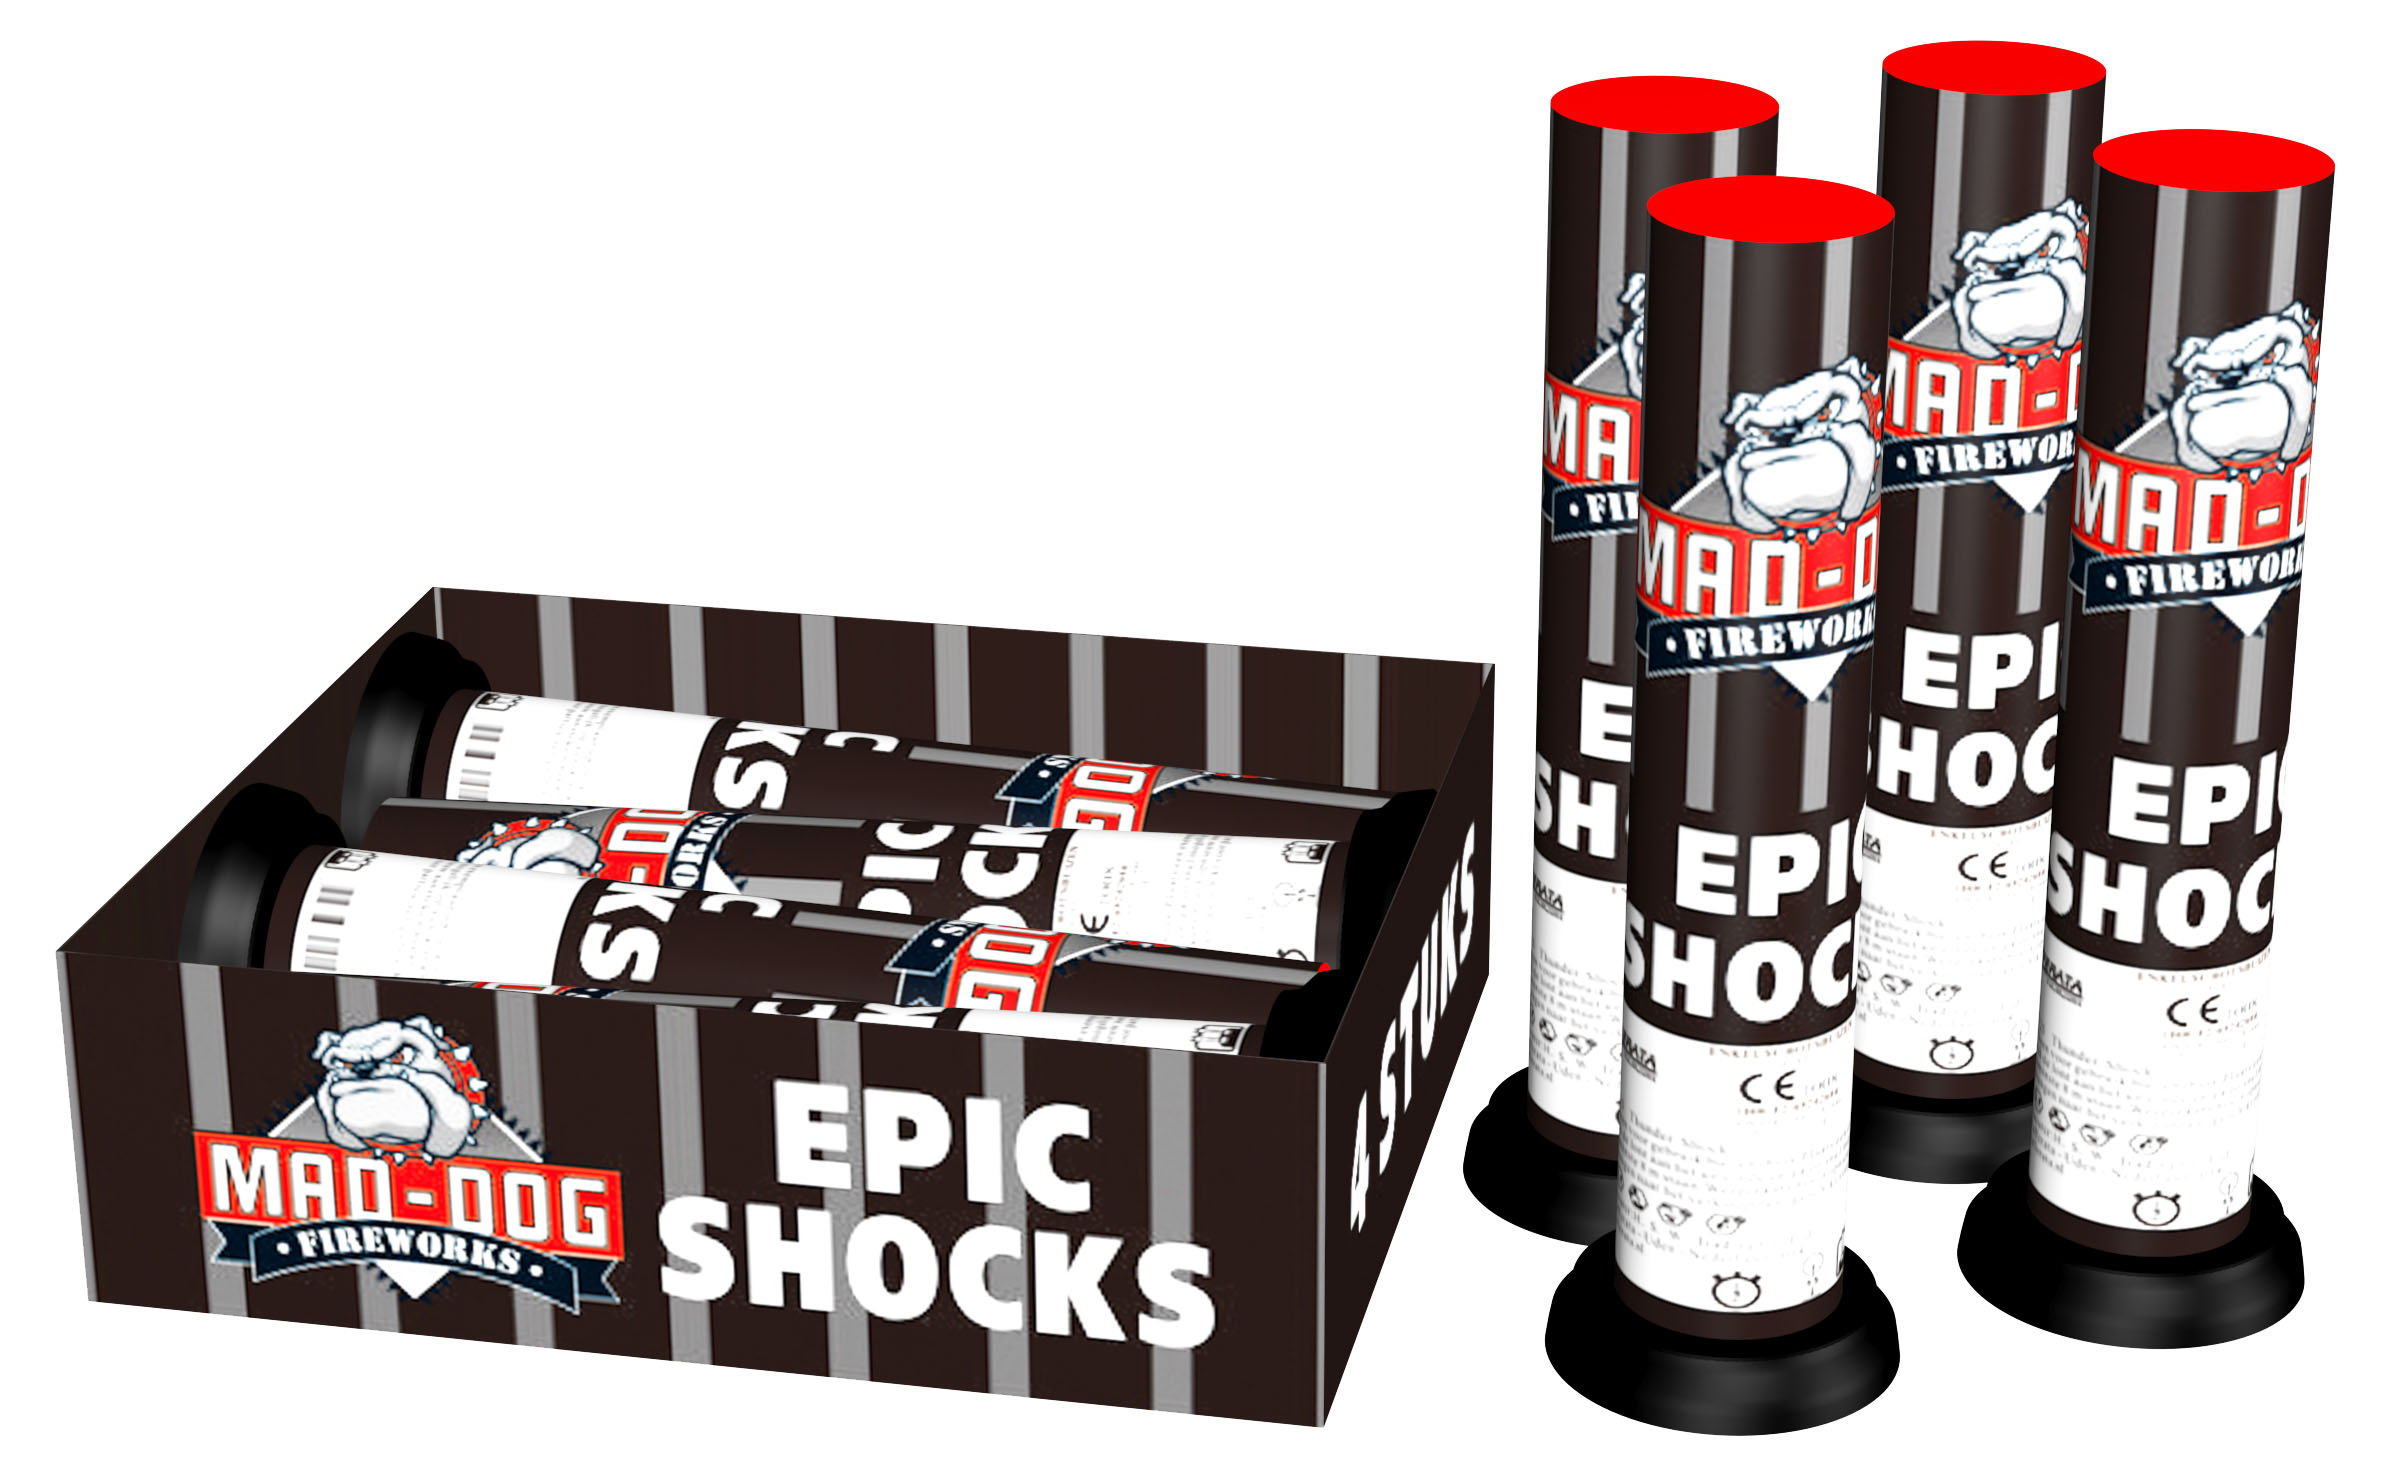 Epic shocks (4 stuks)